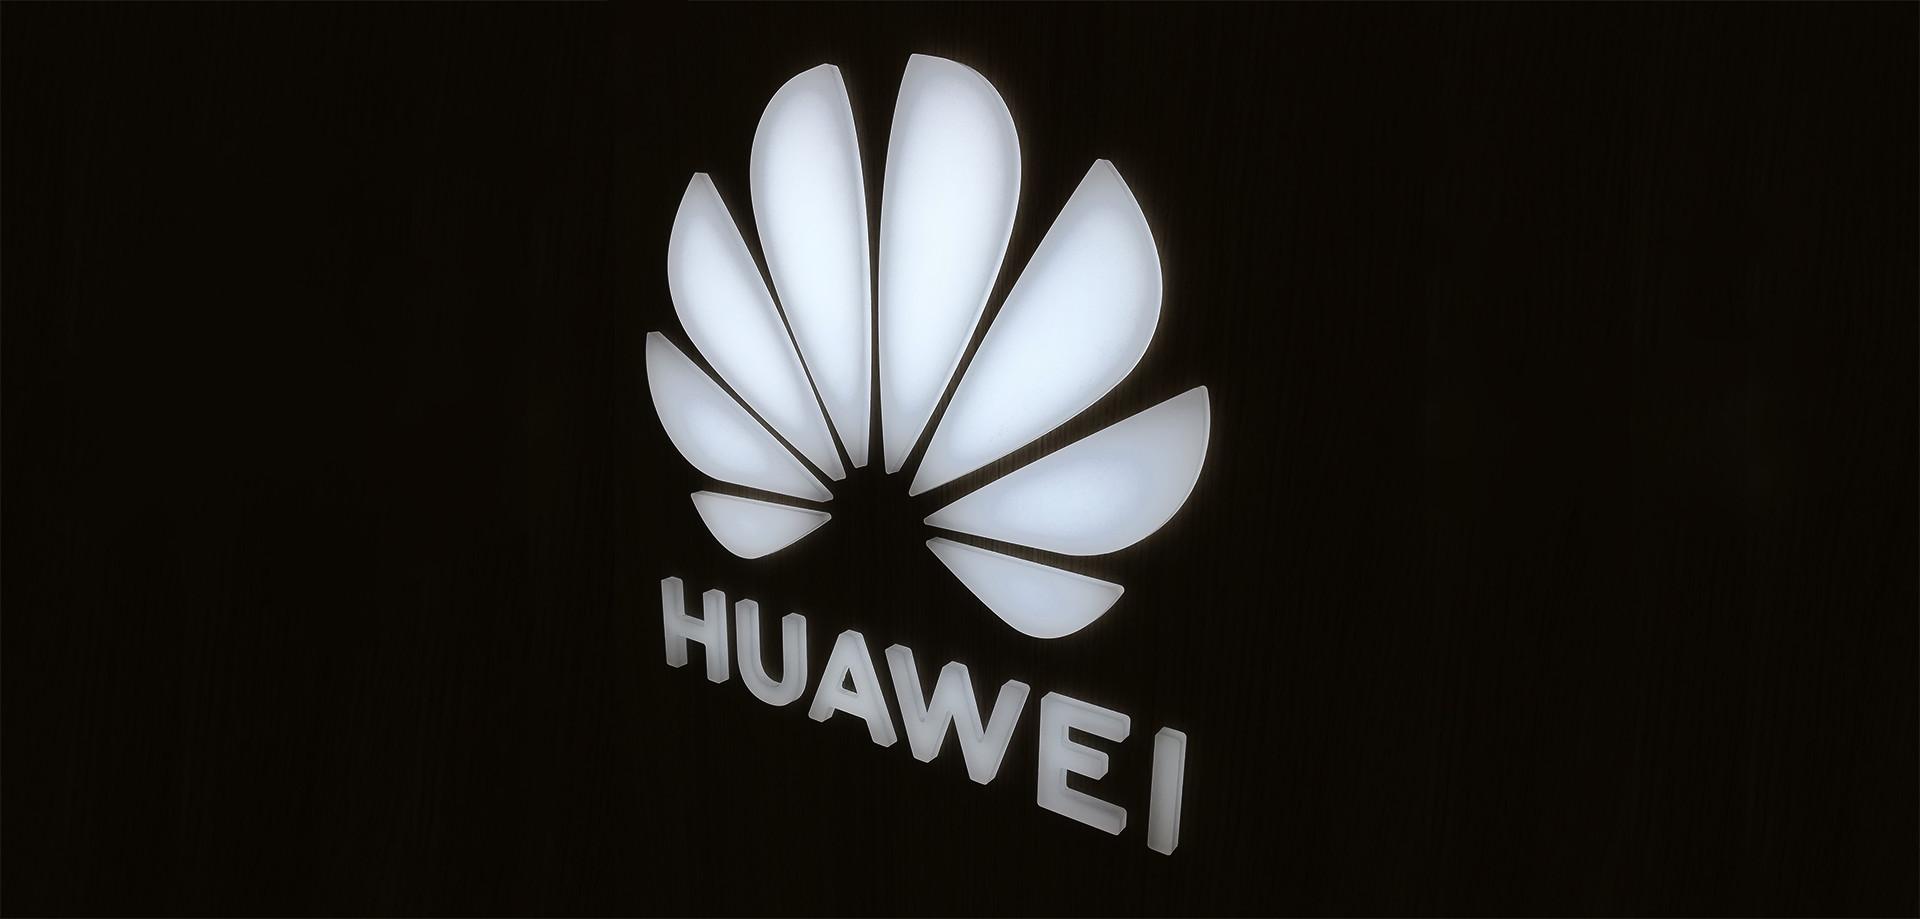 Google ukončí spoluprácu s Huawei, zmizne Gmail aj YouTube